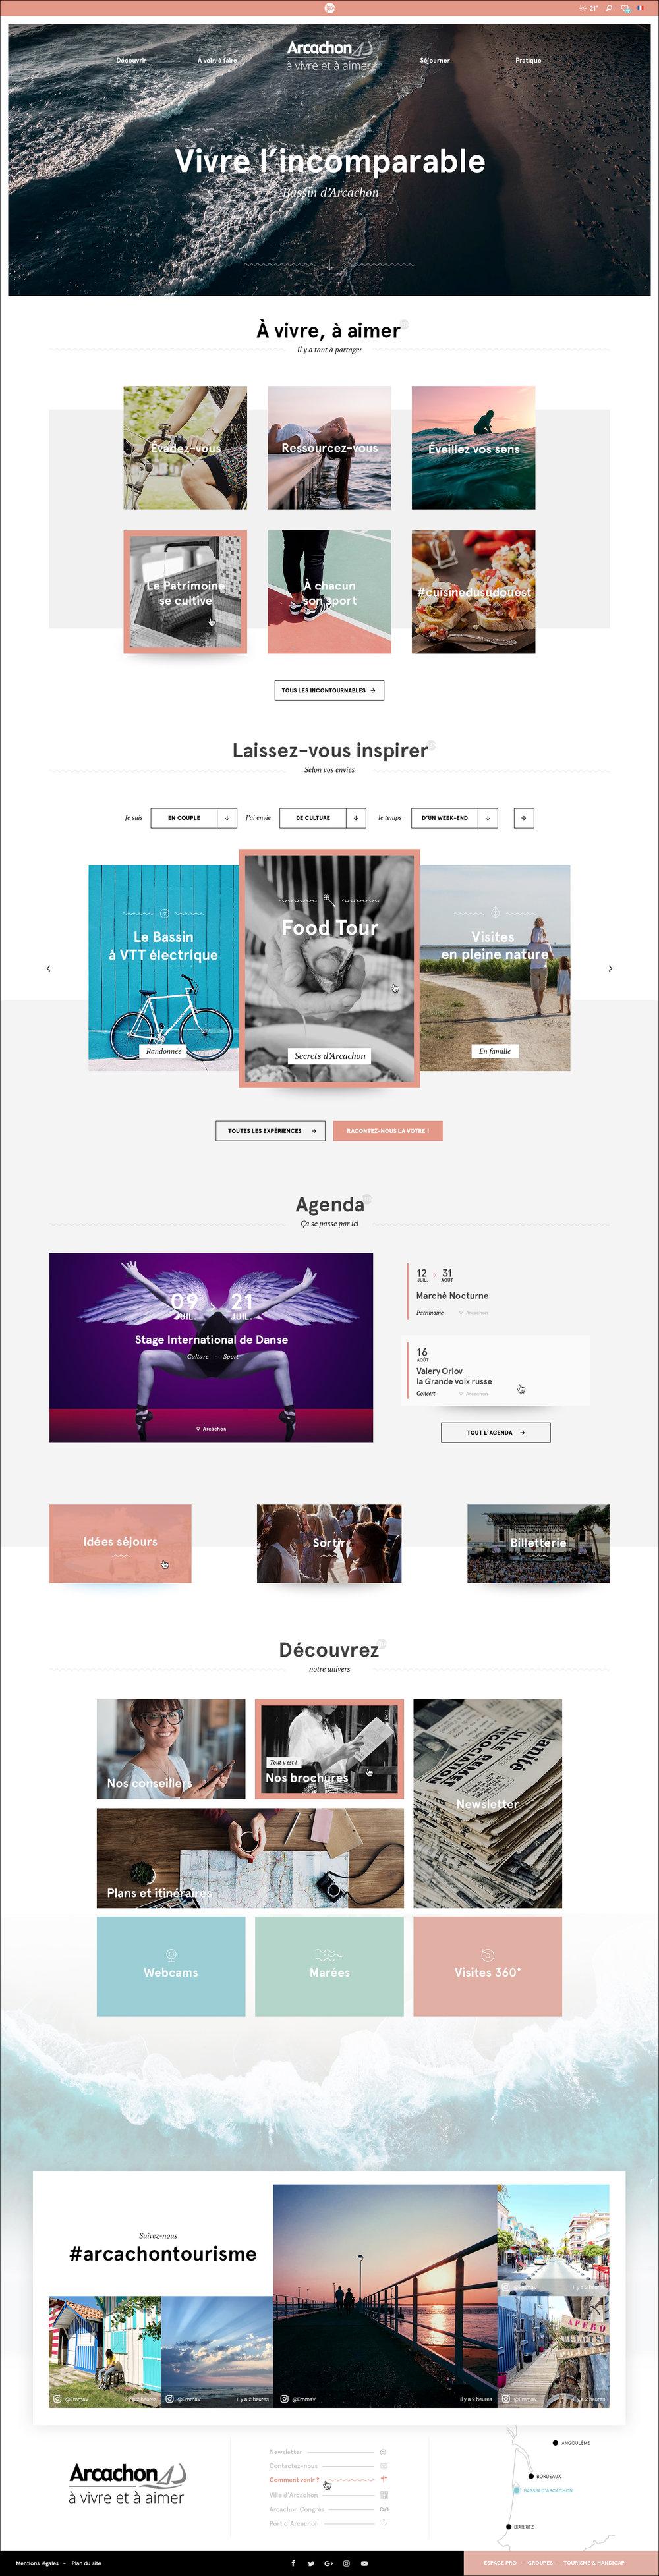 Homepage-arcachon.jpg